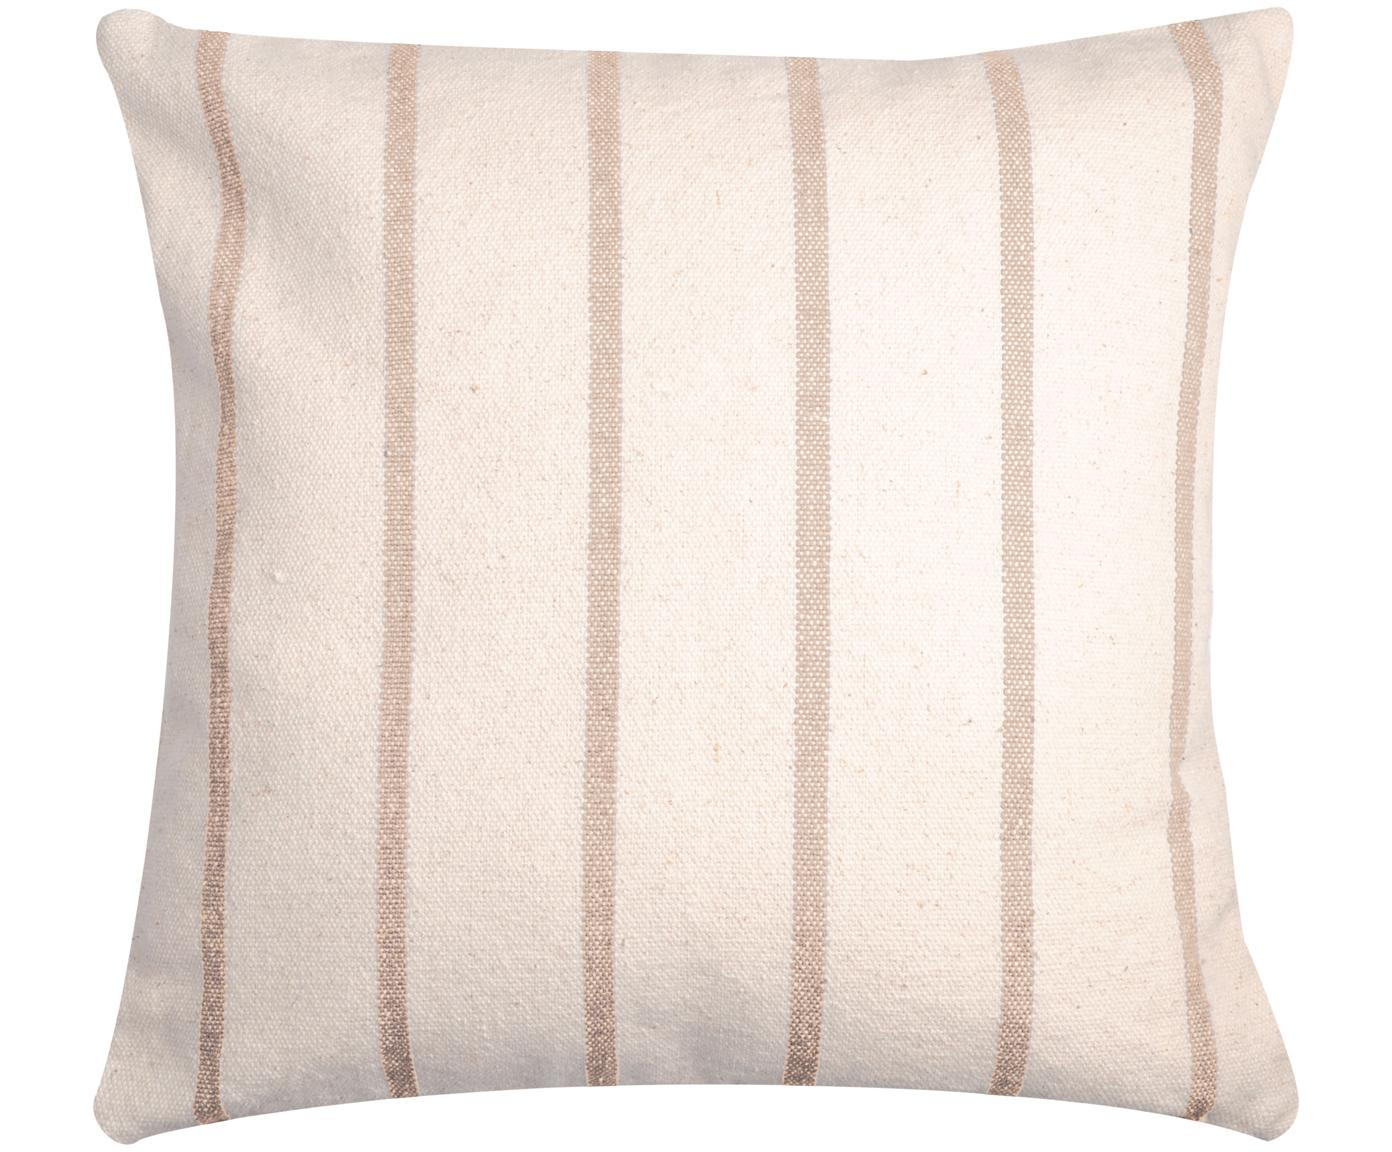 Cojín Pampelonne, con relleno, Funda: algodón, Beige, blanco crudo, An 50 x L 50 cm